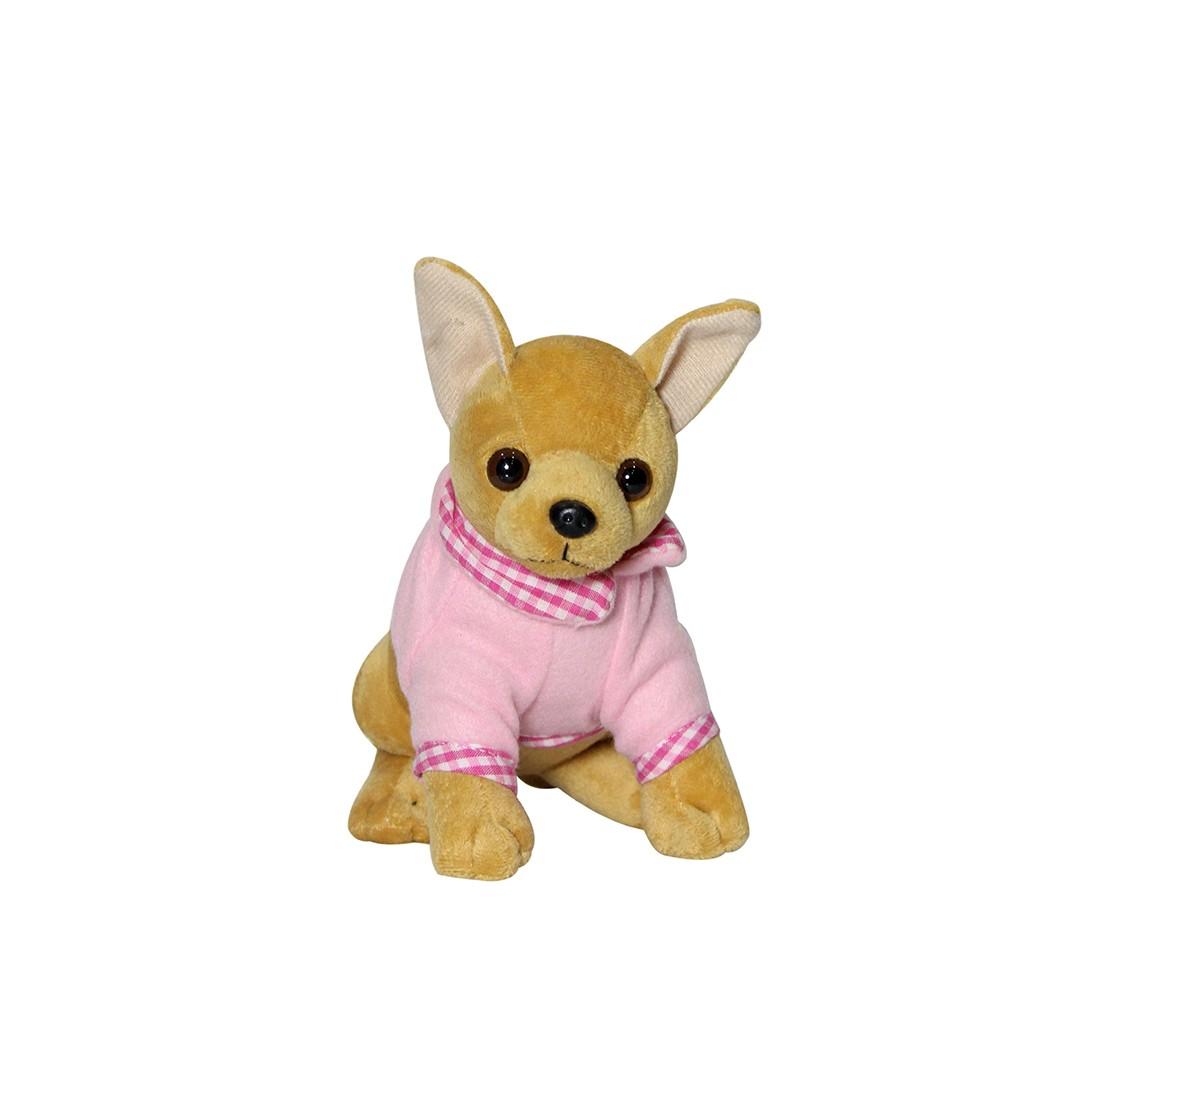 Soft Buddies Chi Hua Hua Dog Quirky Soft Toys for Kids age 12M+ - 17.78 Cm